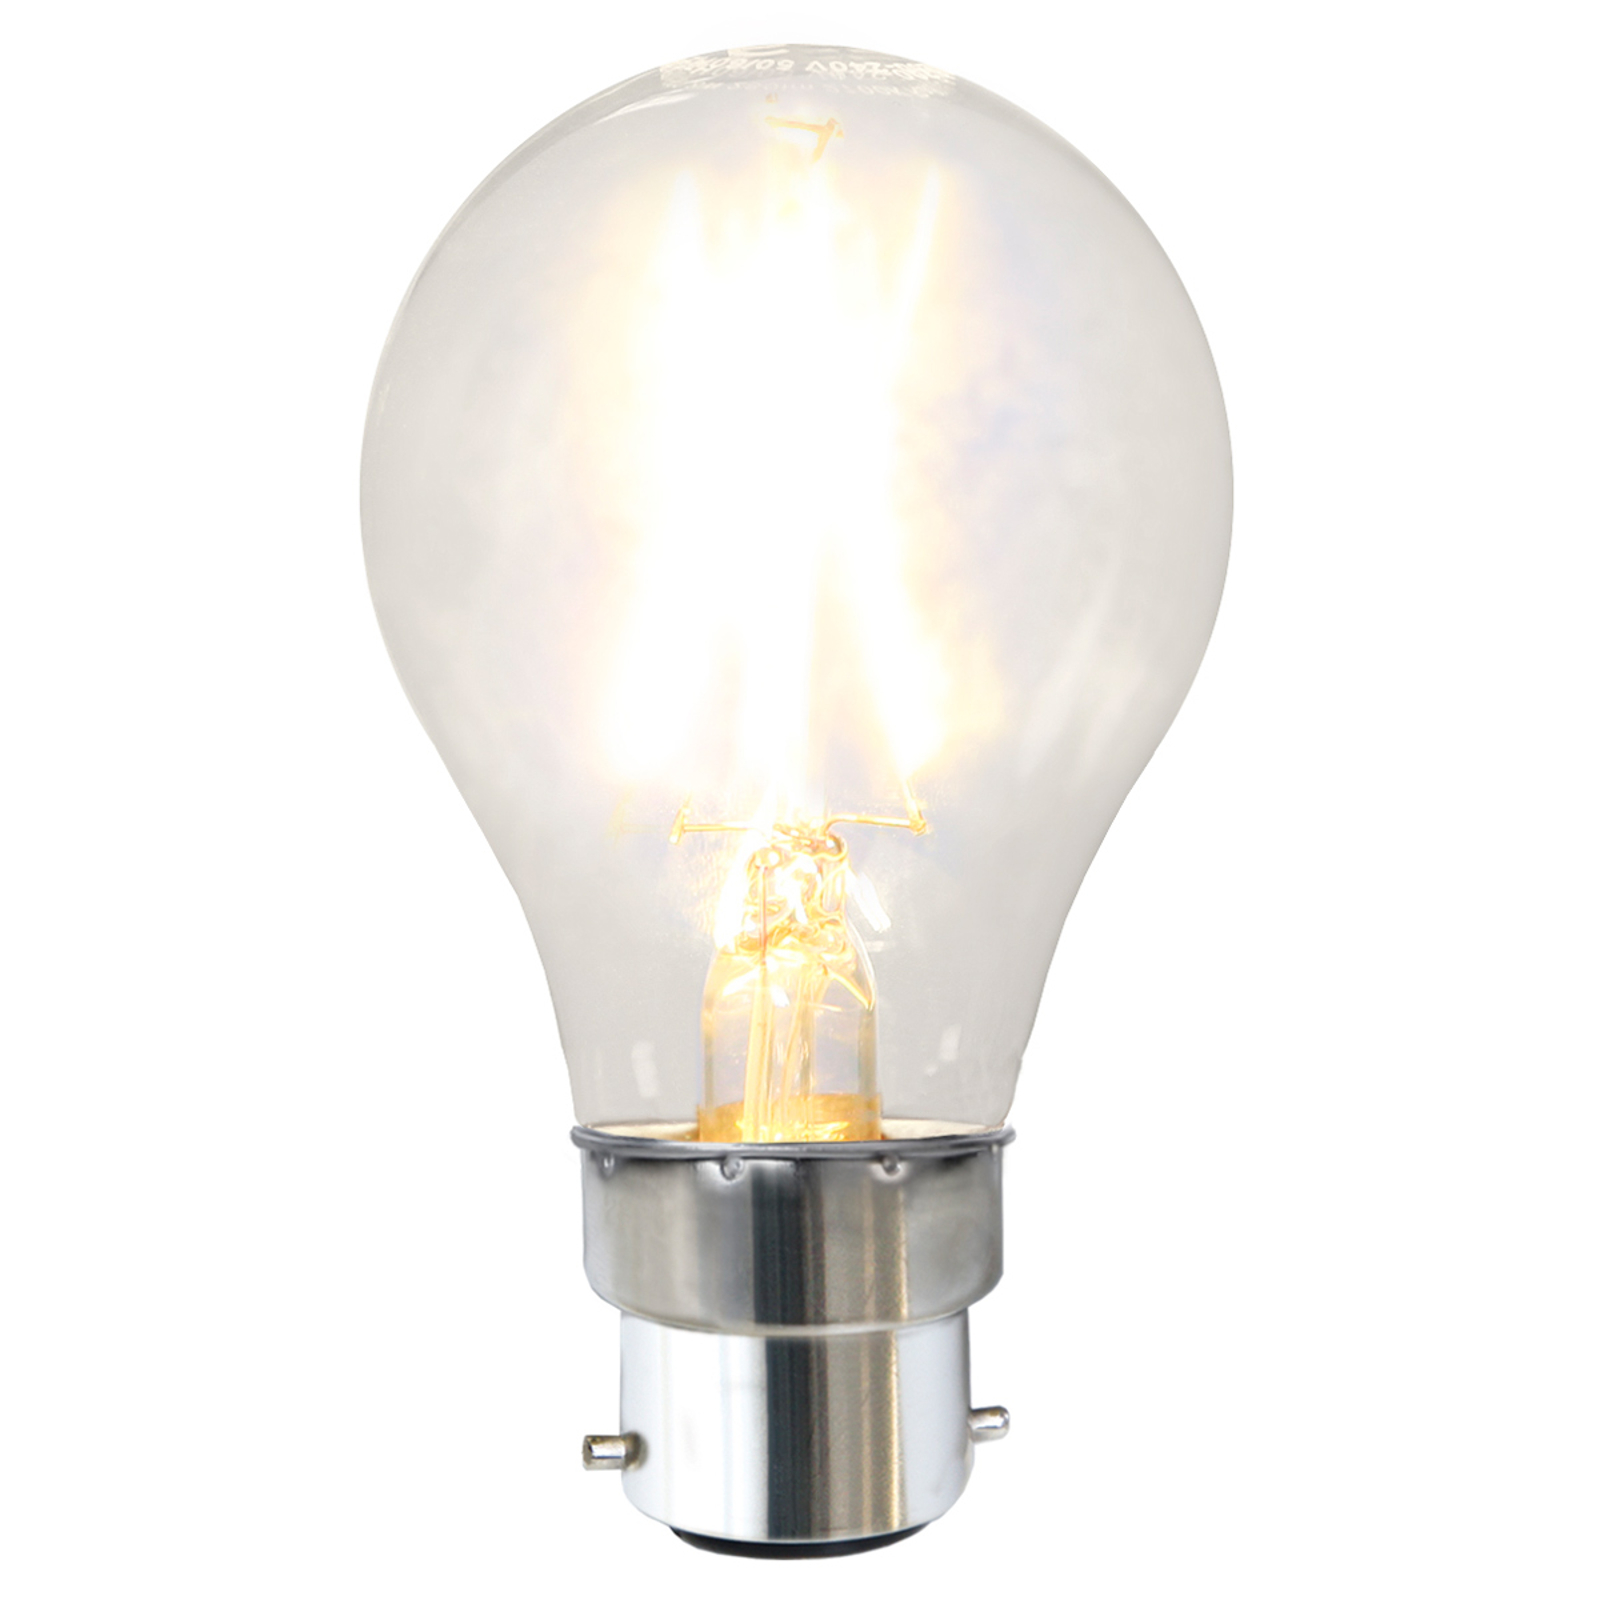 Ampoule LED B22 1,6W, blanc chaud